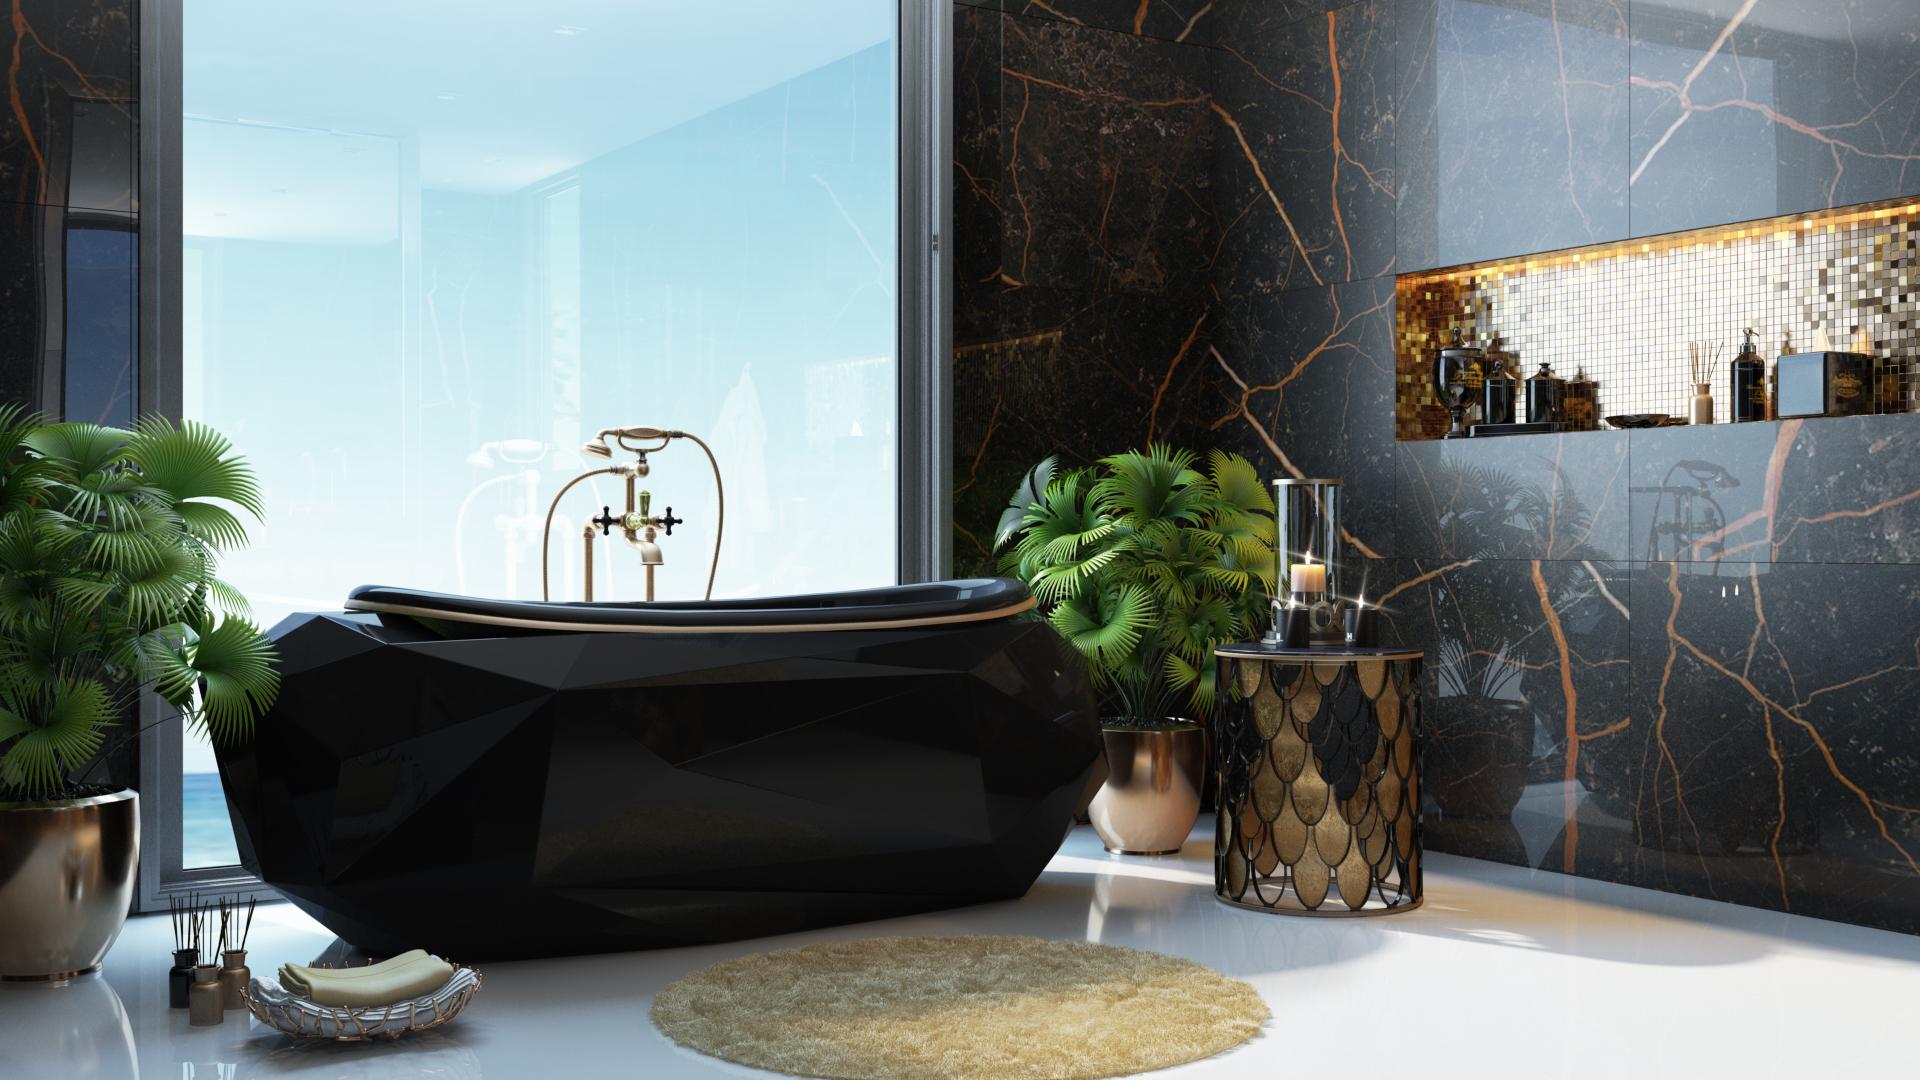 Marketing 3D Visualization for Bathroom Furniture